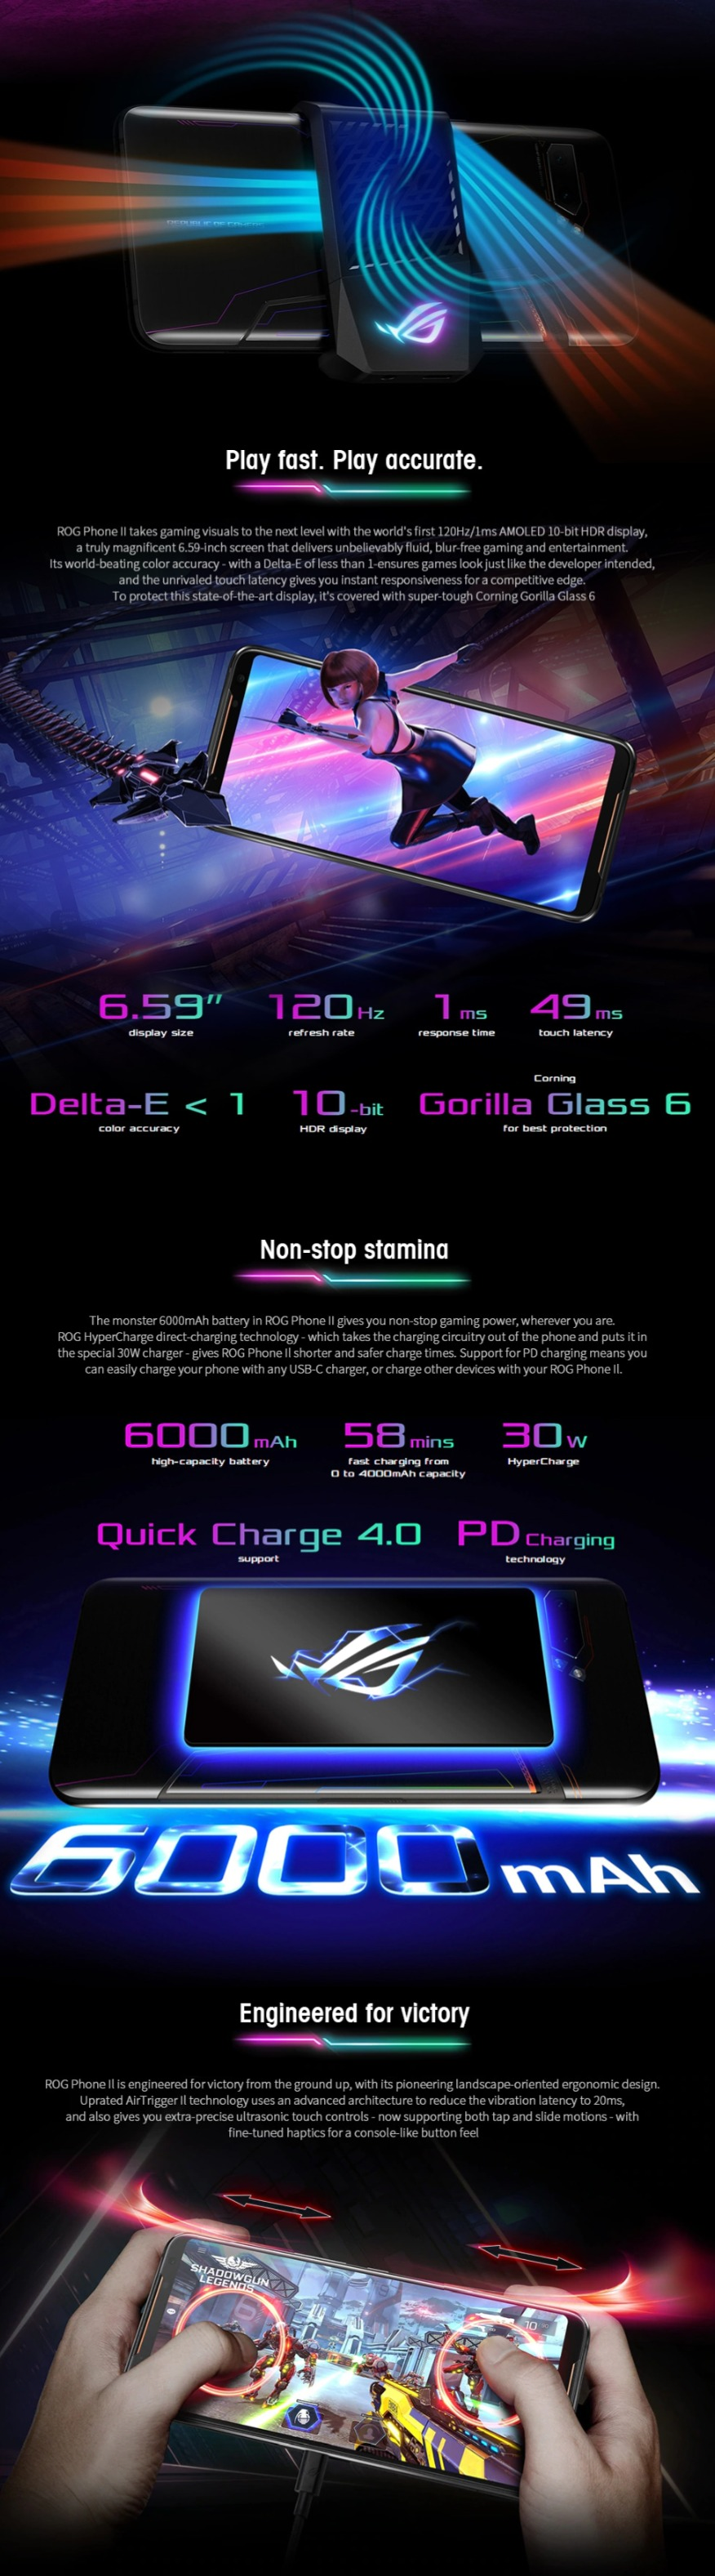 Black Friday Asus Sale - ASUS ROG Phone 2 Gaming 4G Smartphone